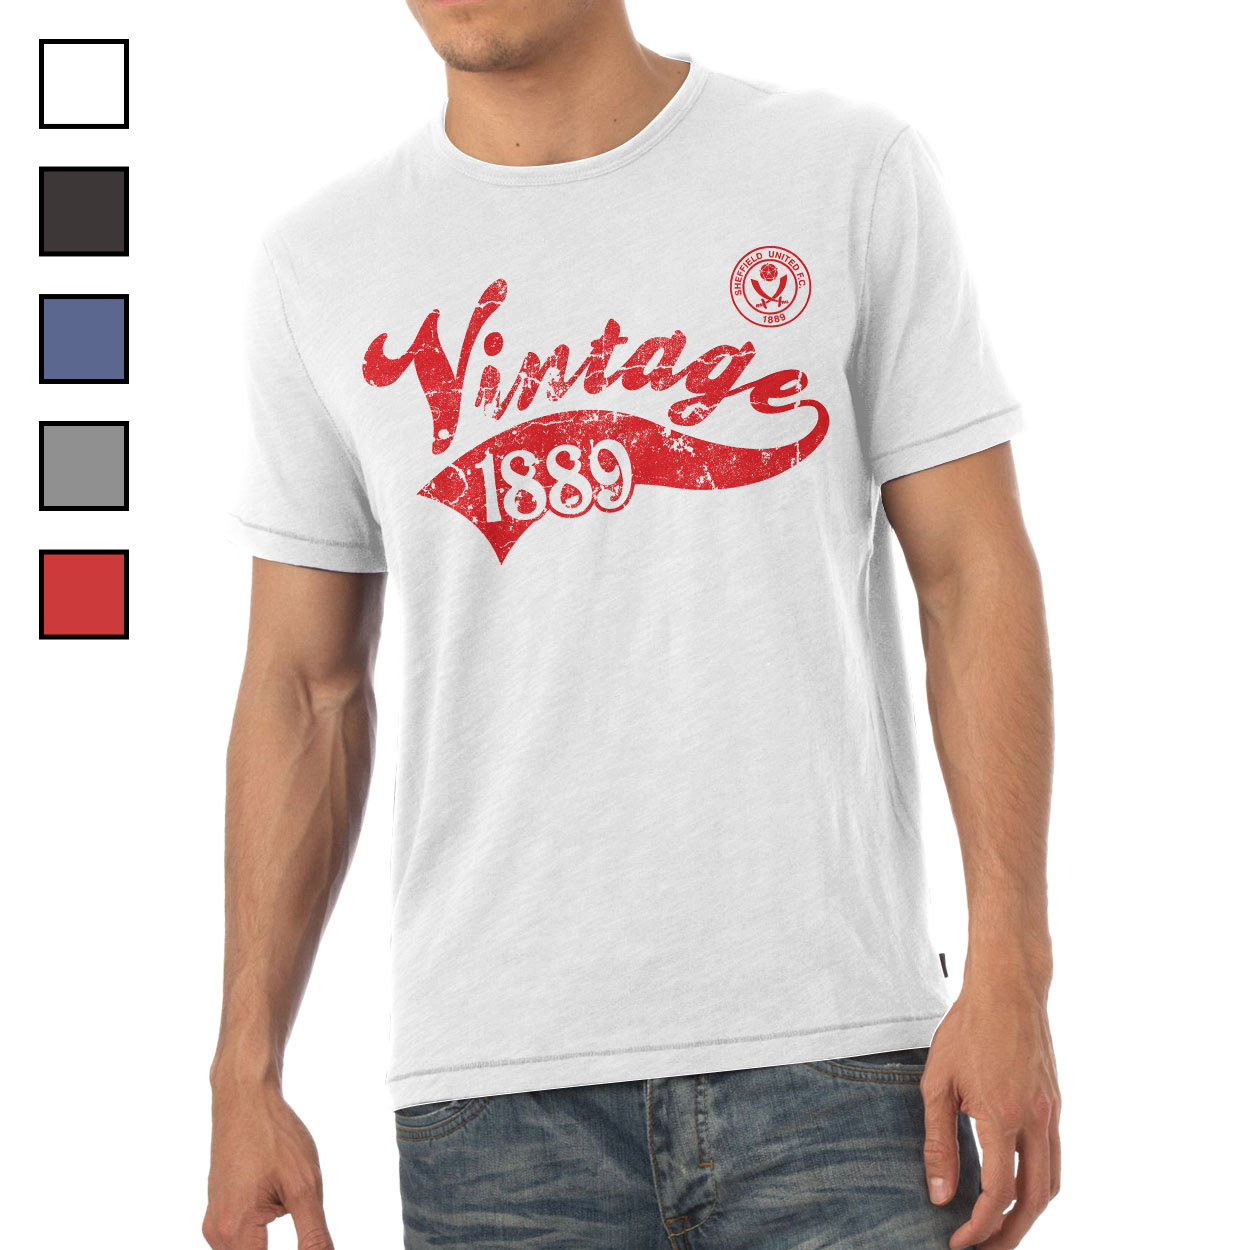 Sheffield United FC Mens Vintage T-Shirt